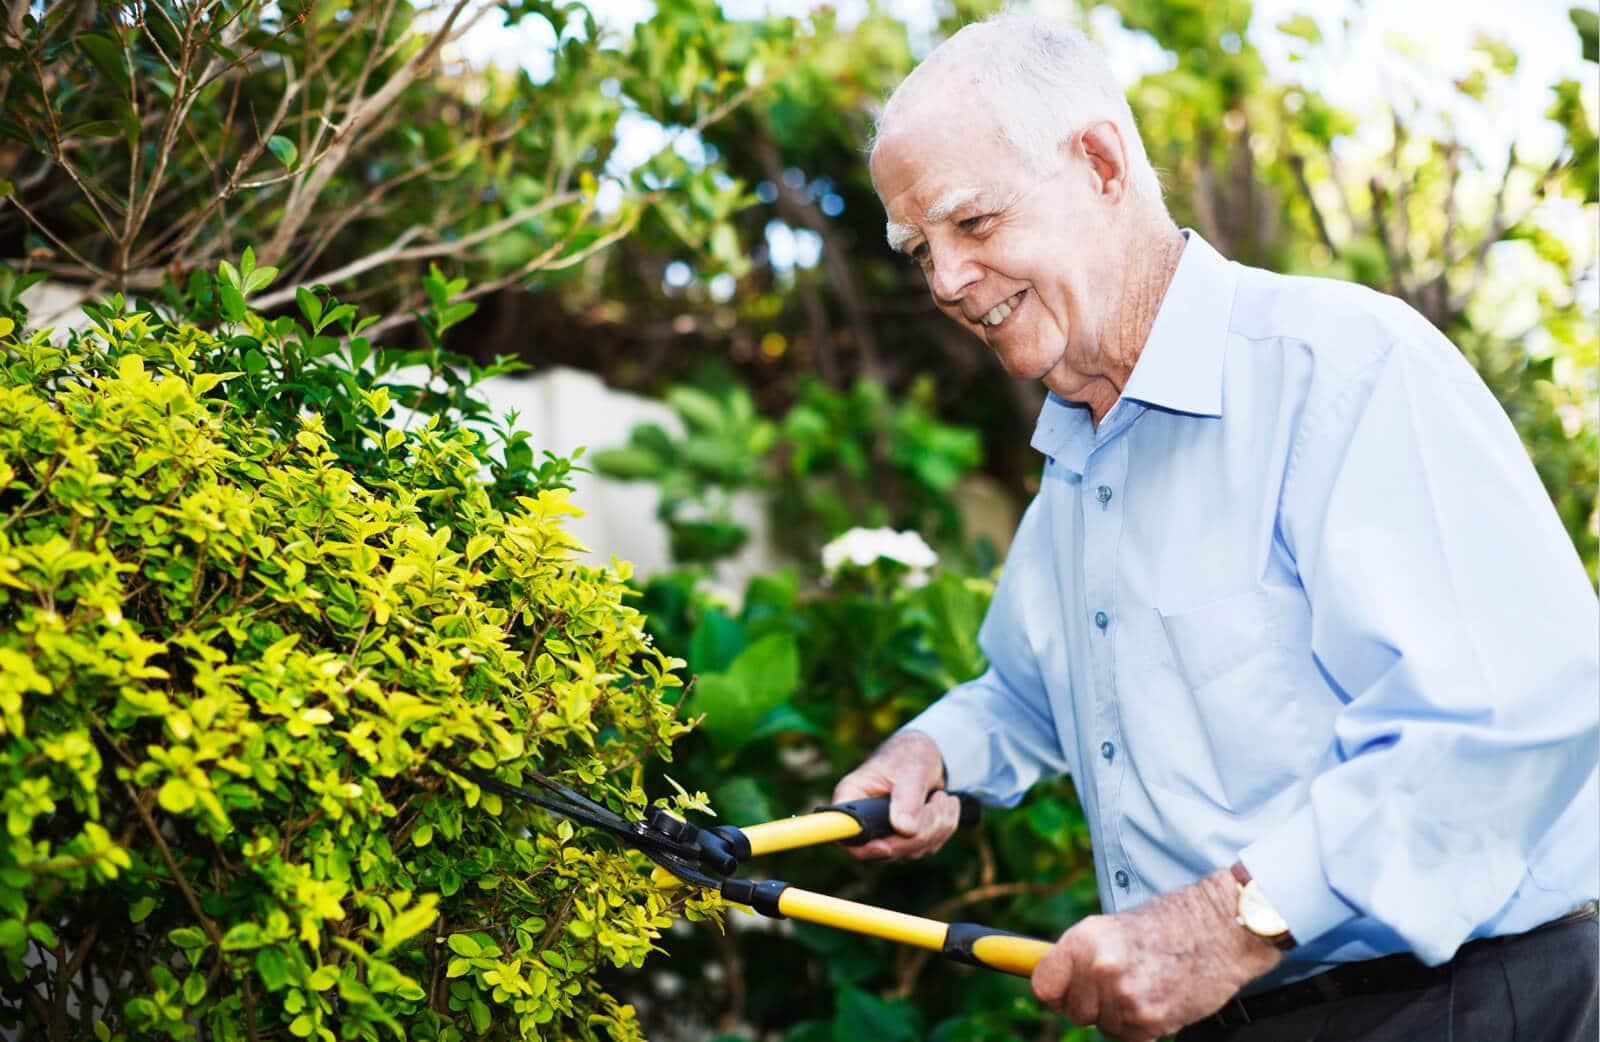 trimming bush